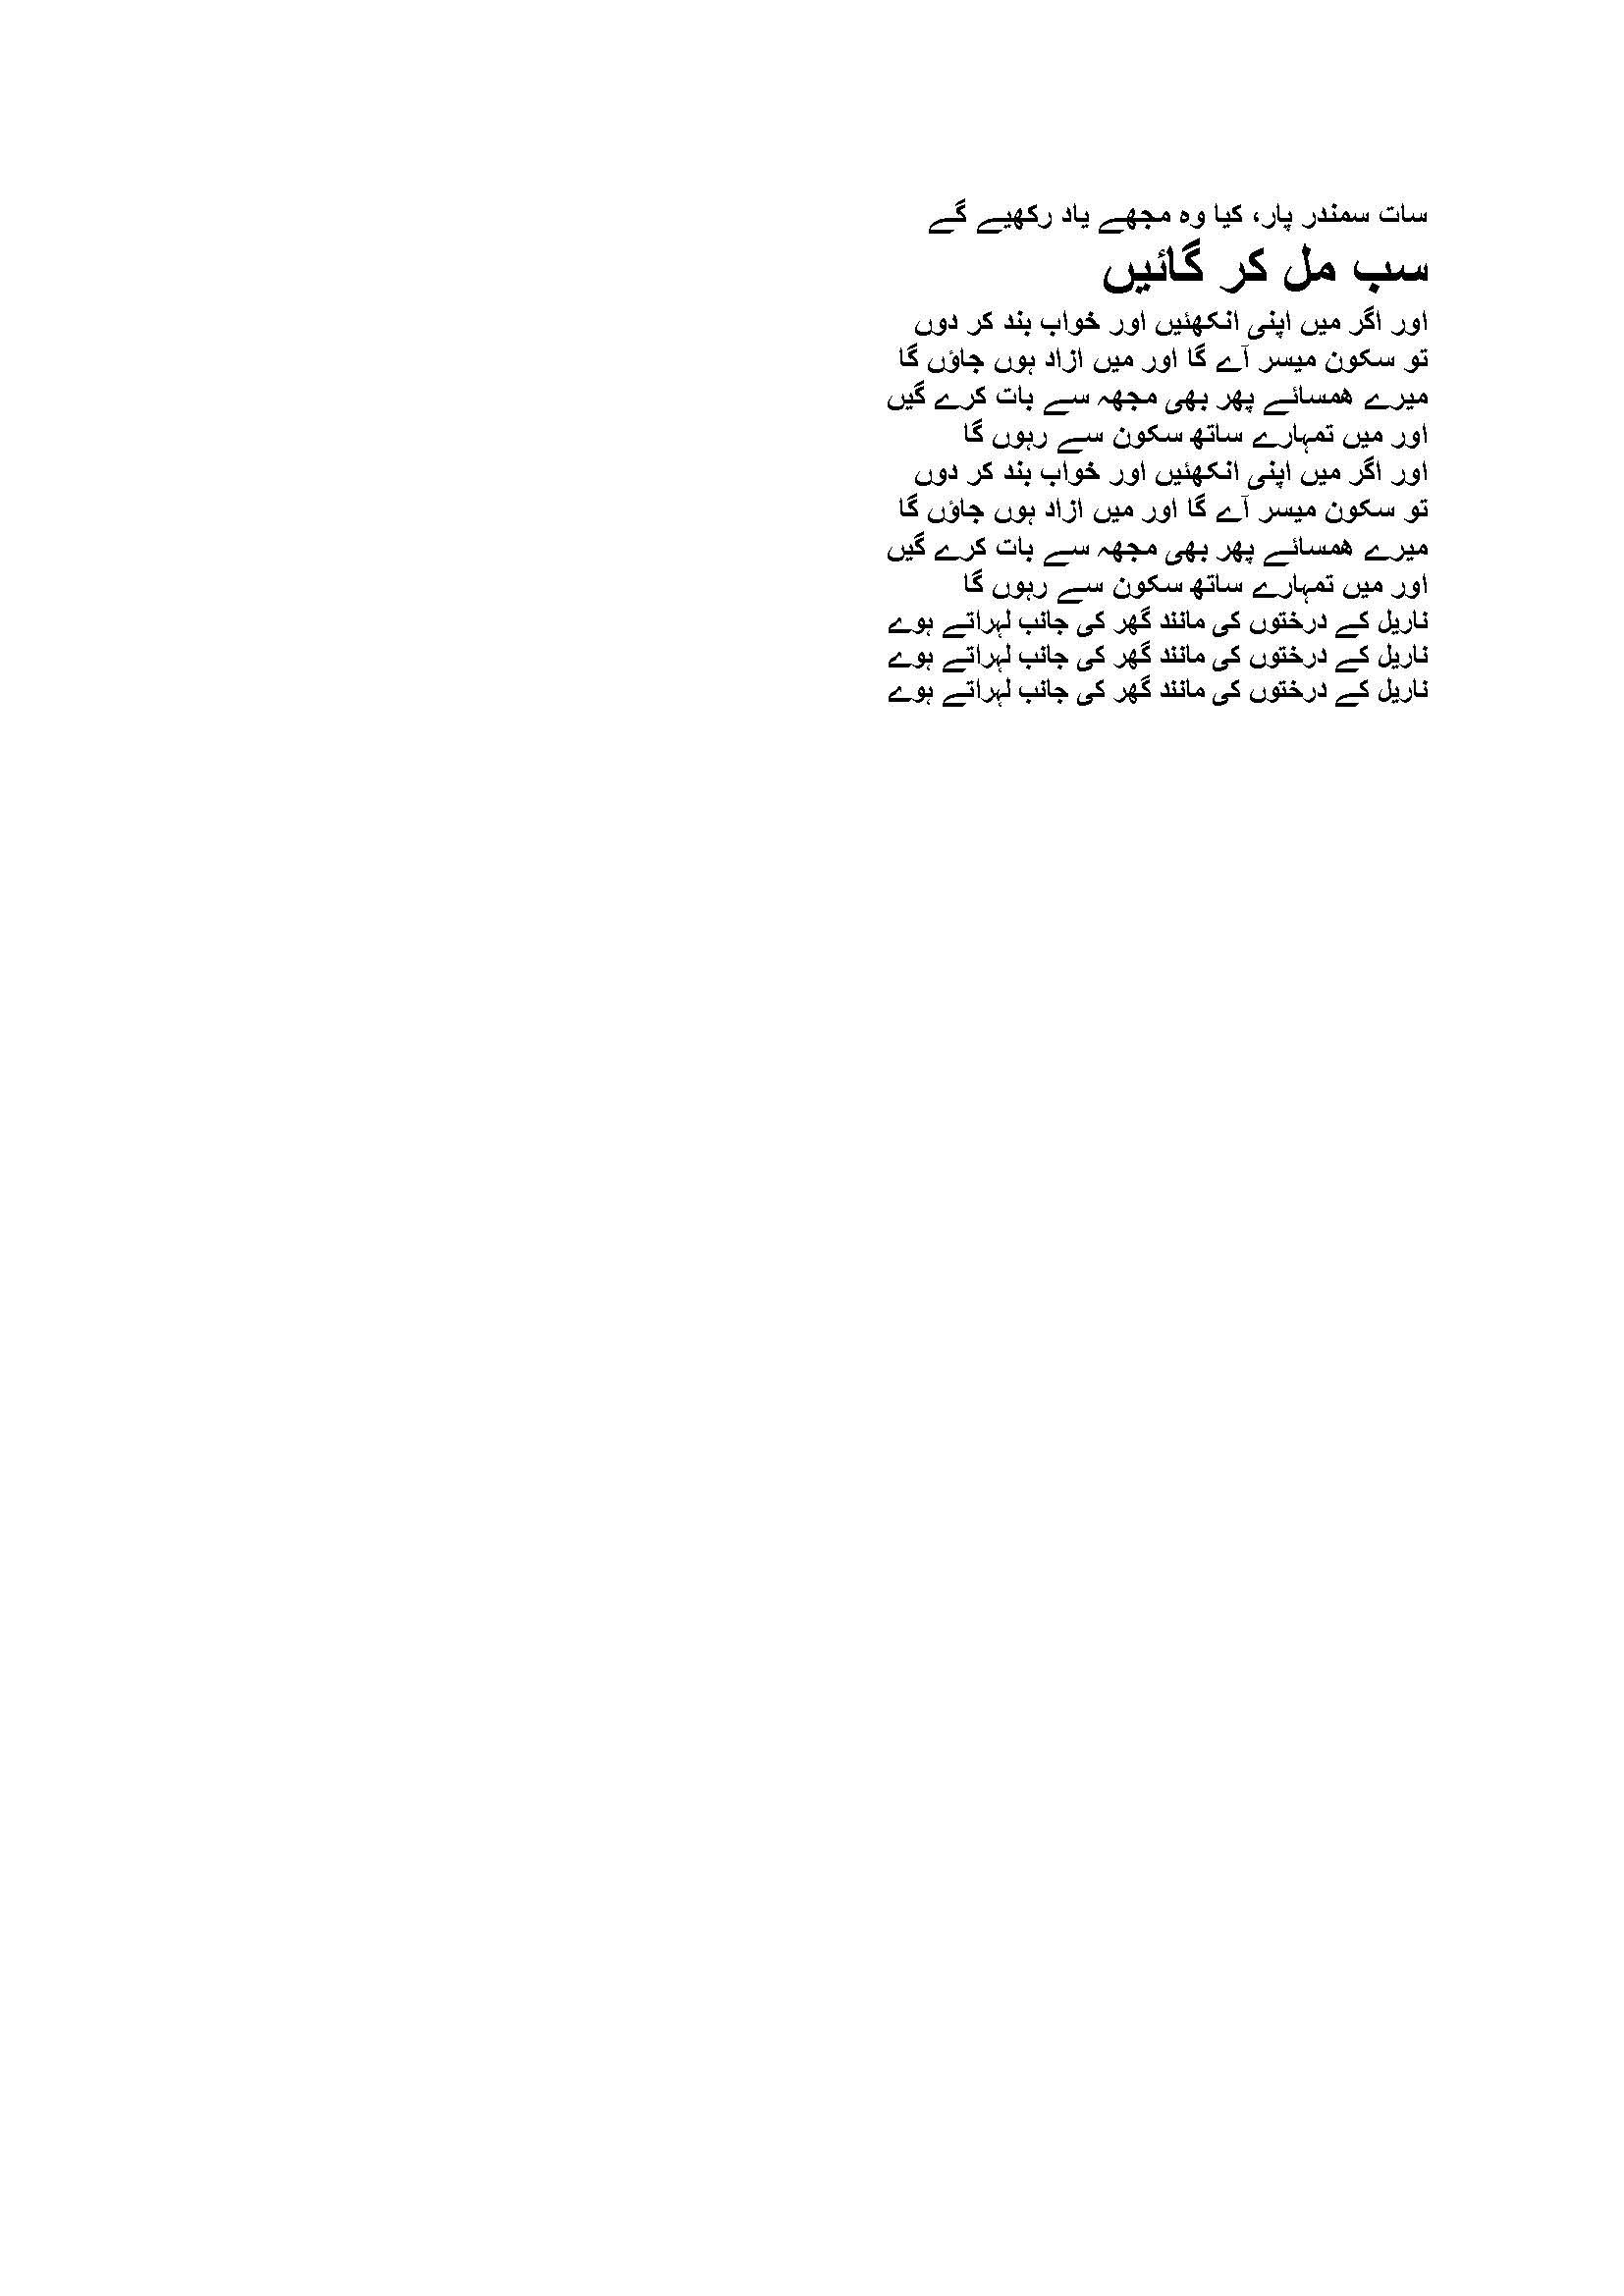 WAVING LIKE THE PALM TREES - URDU_Page_2.jpg